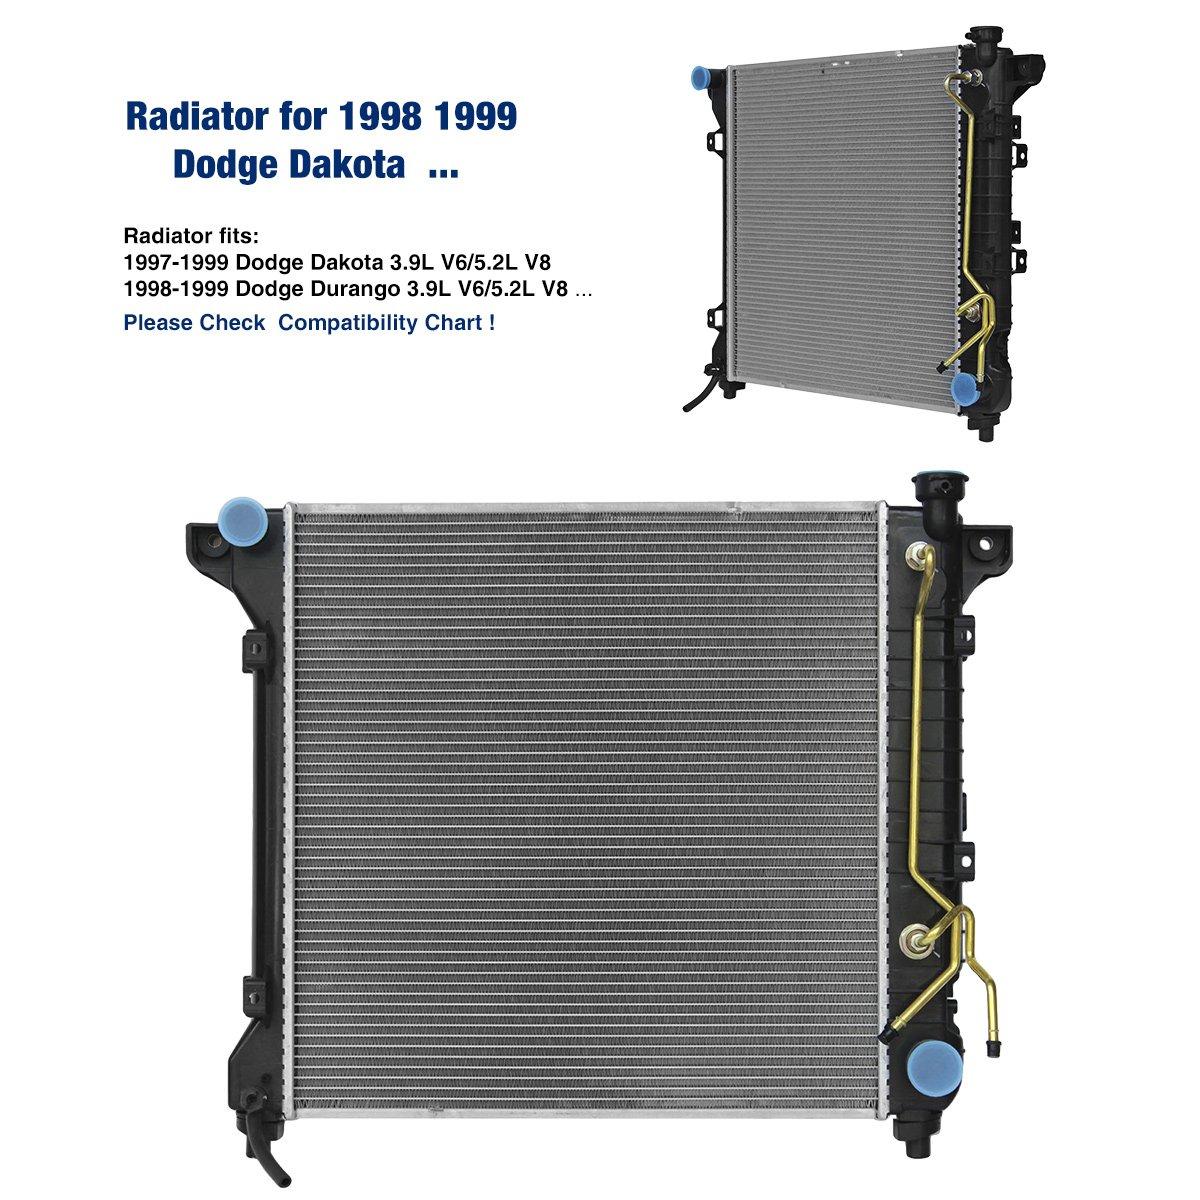 Radiator For Dodge 1997 1999 Dakota 39l V6 52l V8 1998 98 Blower Wiring Diagram Durango 2000 Automotive